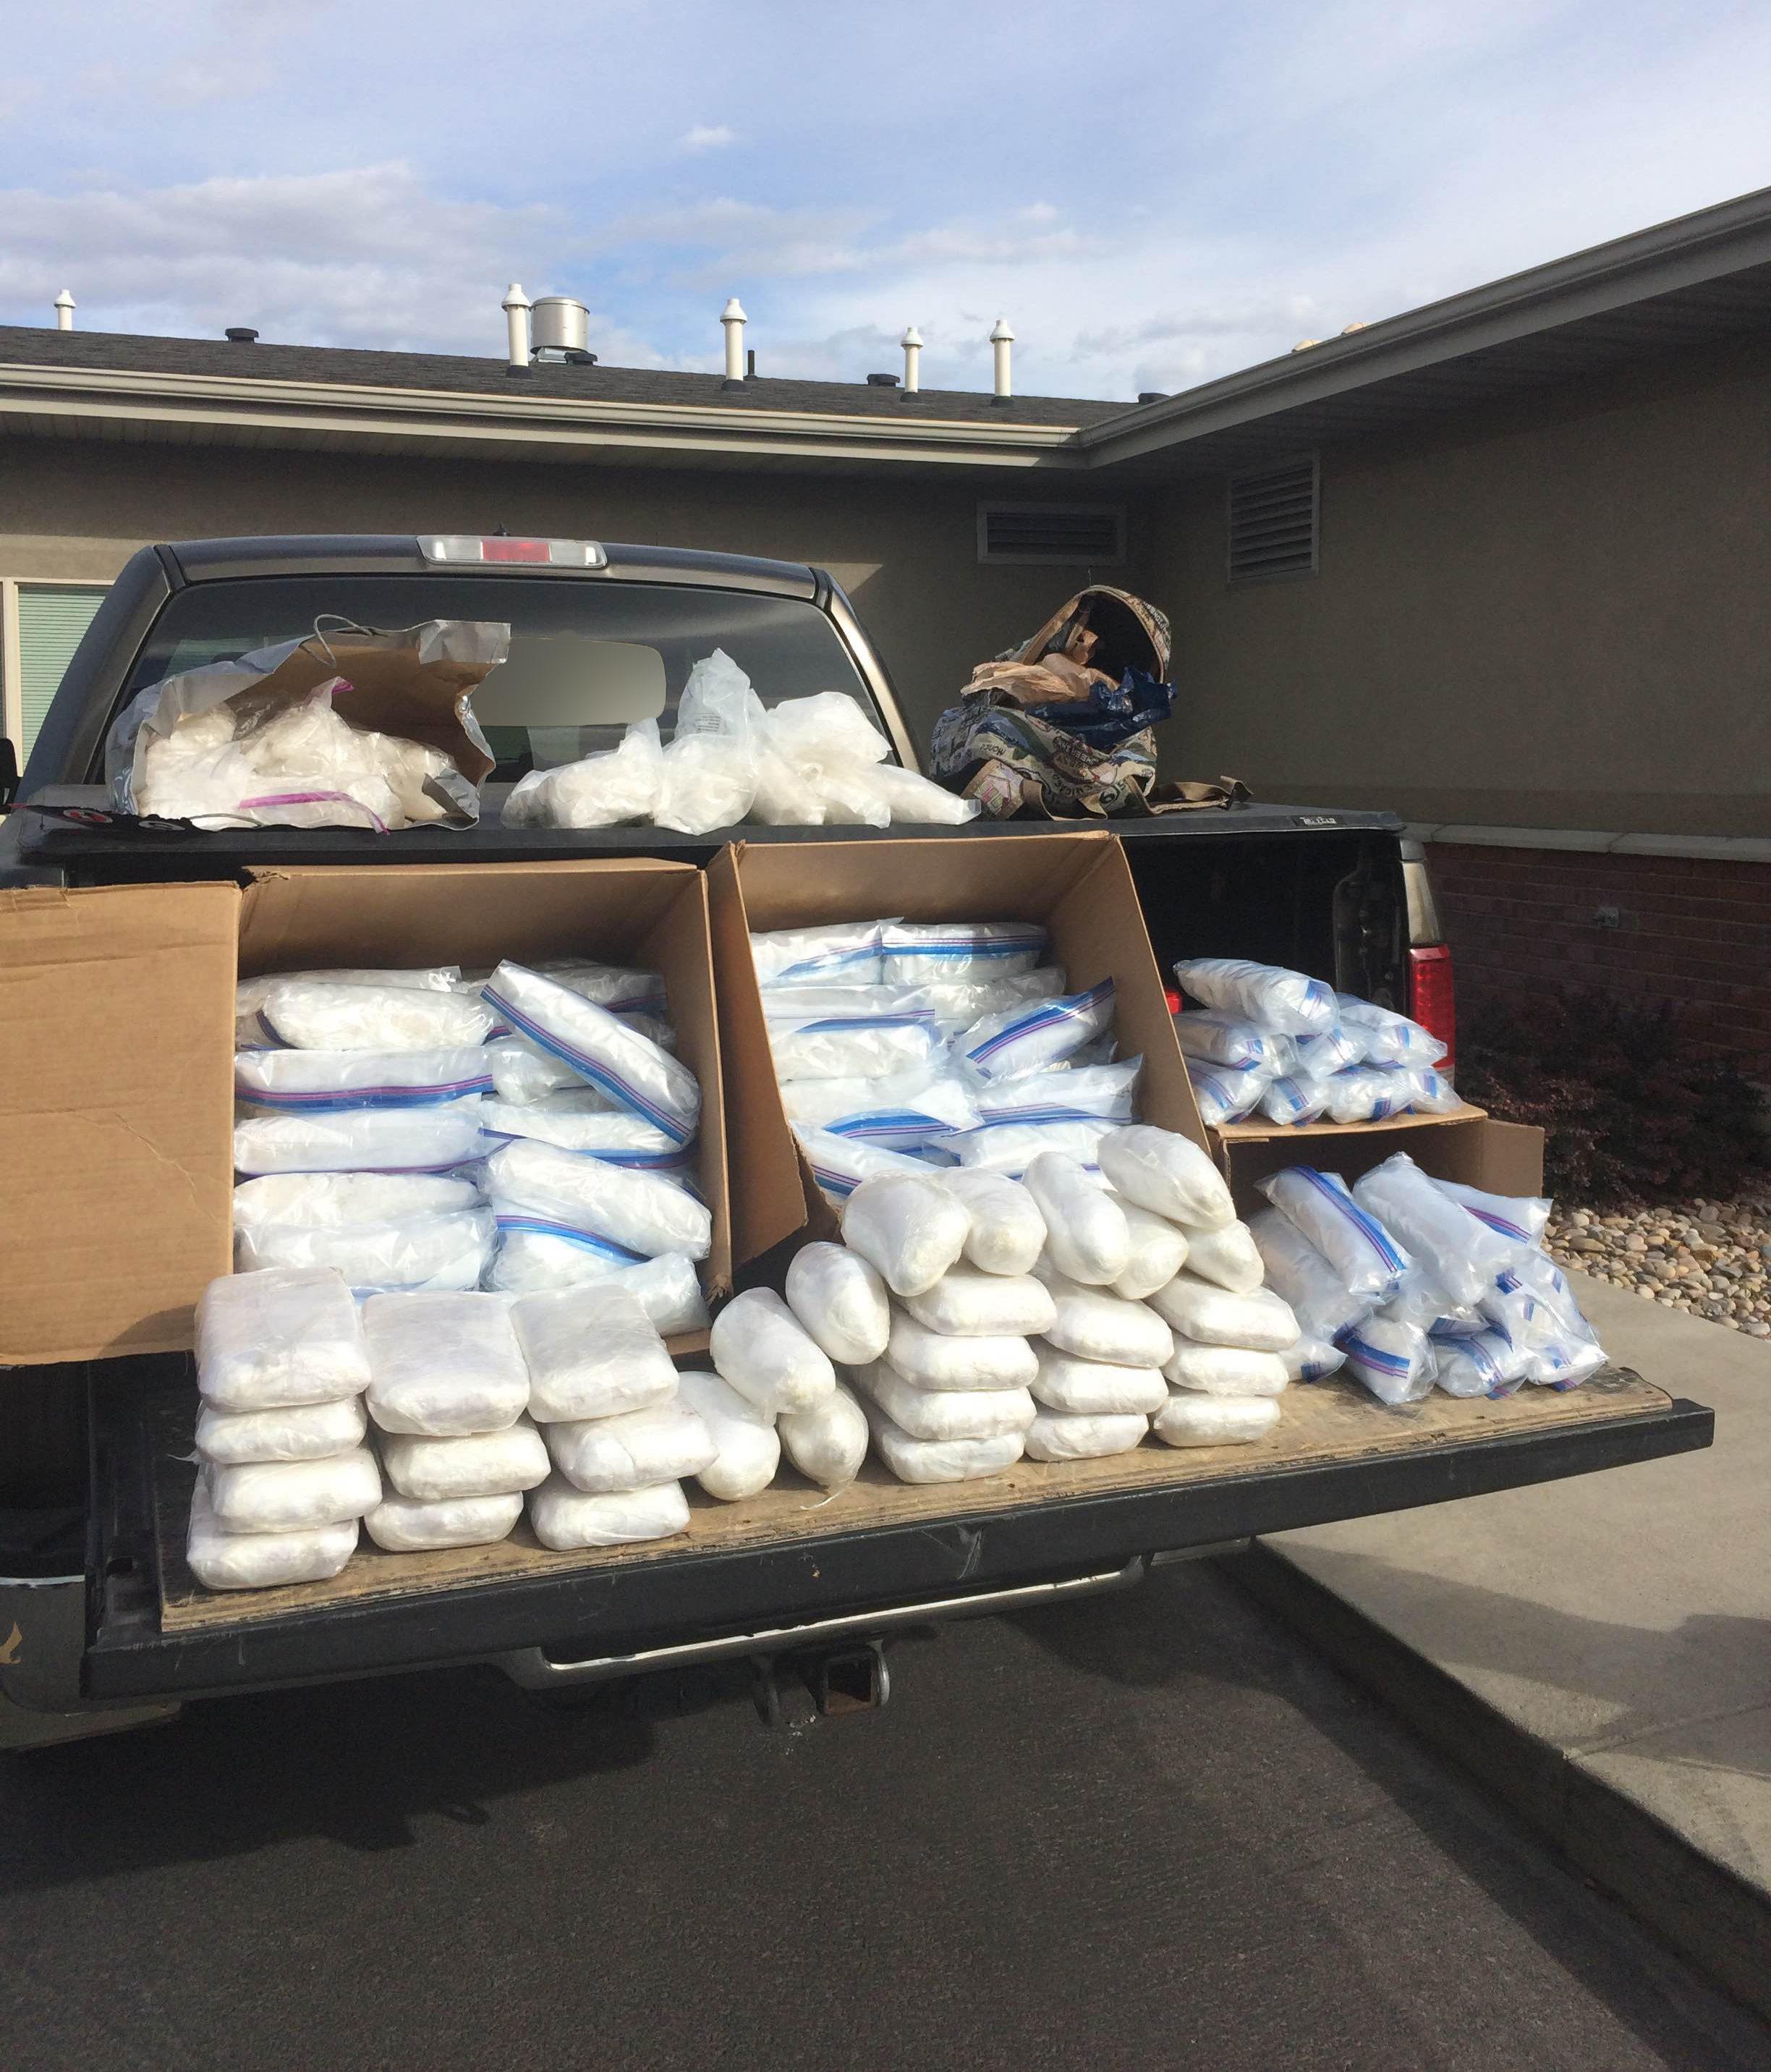 Utah Highway Patrol troopers seized 236 pounds of meth in record multimillion-dollar bust during a traffic stop in Springville, Utah, Oct. 10, 2016 | Photo courtesy of Utah Highway Patrol, St. George News